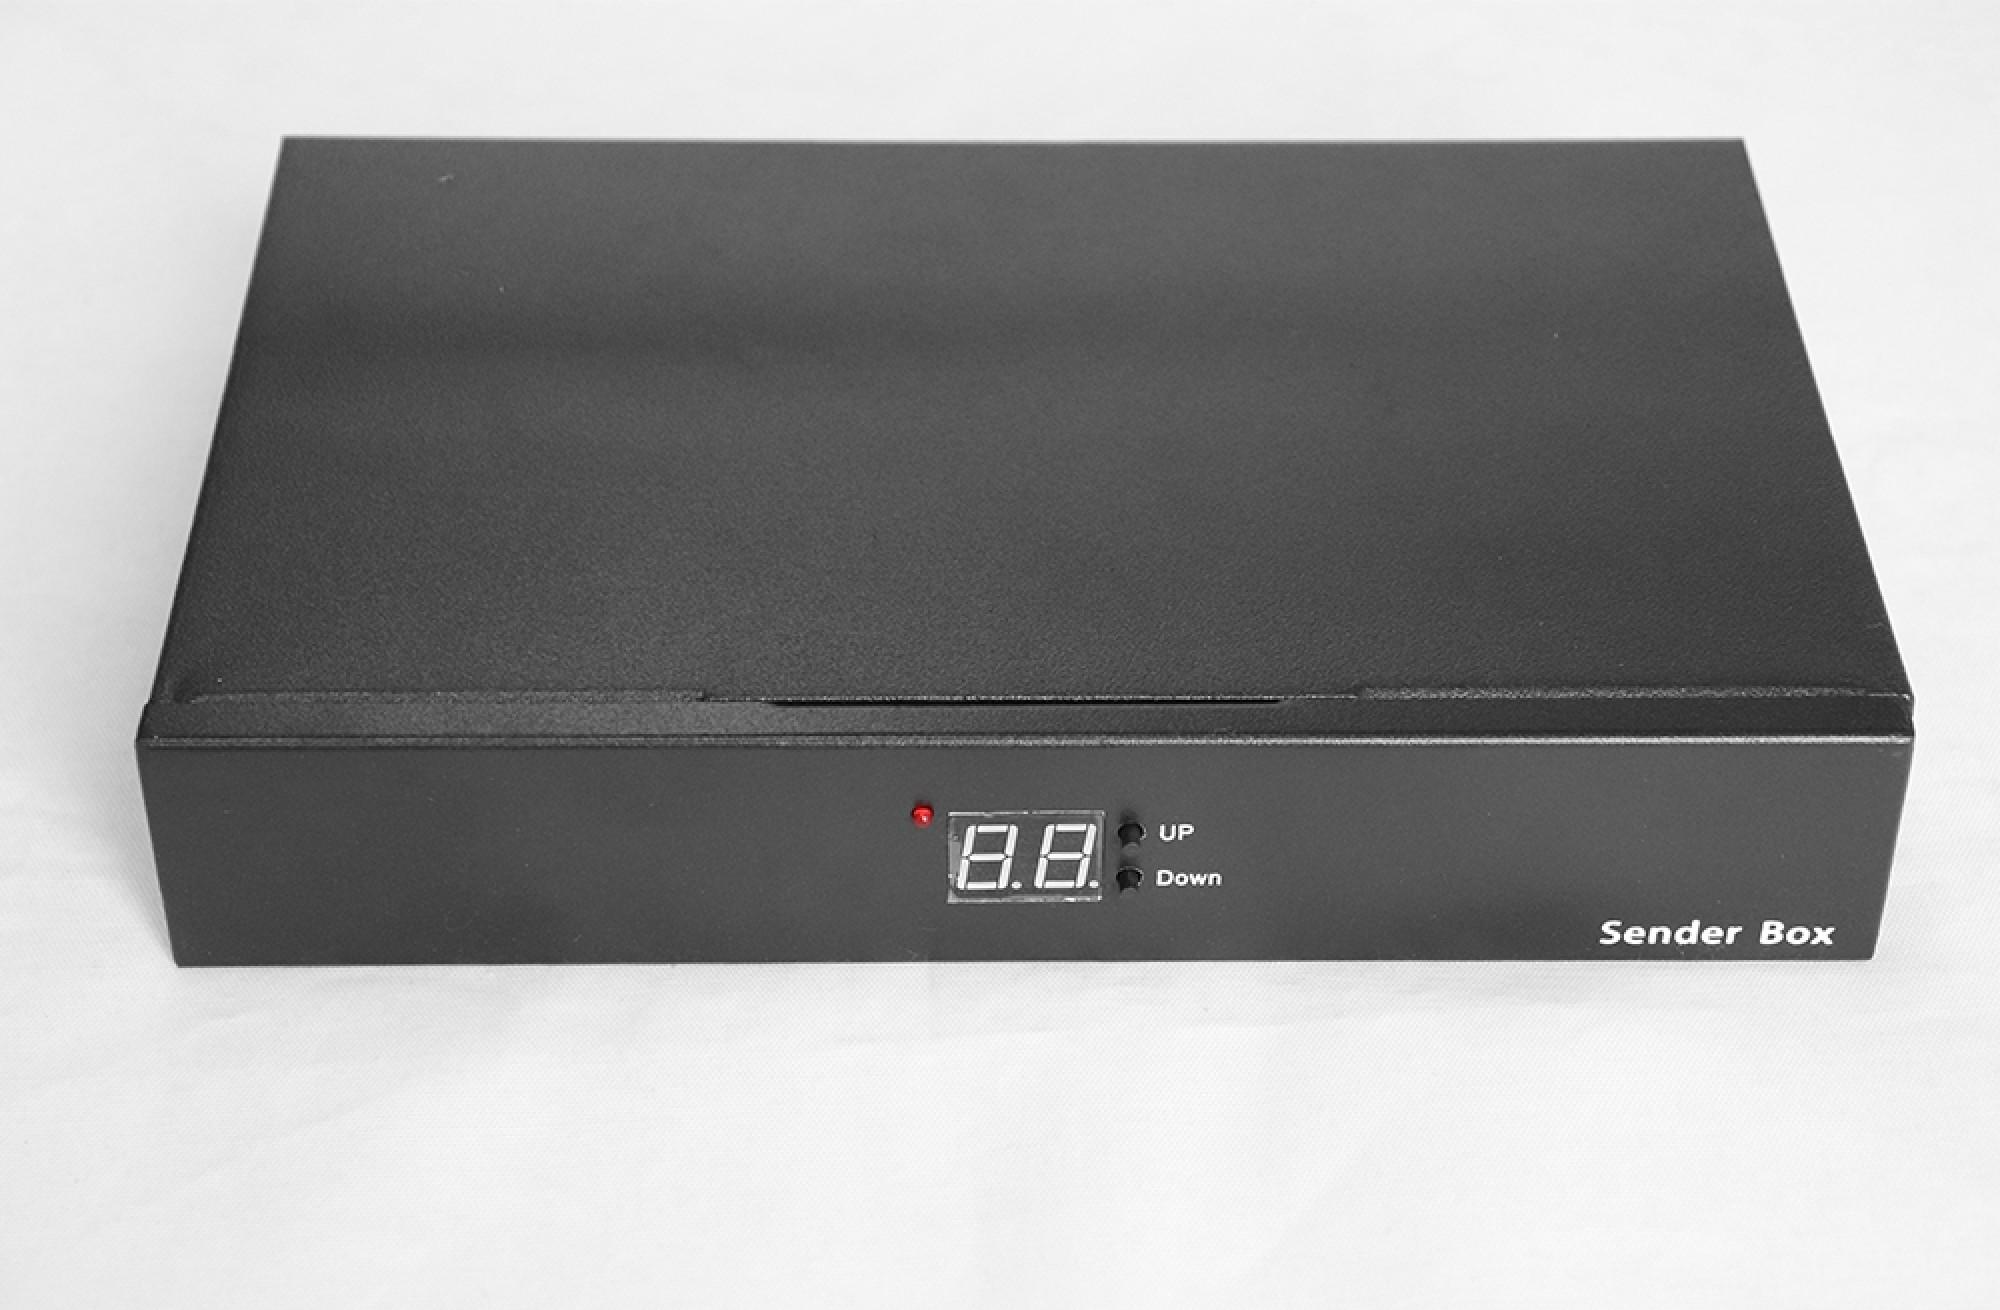 LINSN SB-8 LED Sender Box without Sending Card Inside